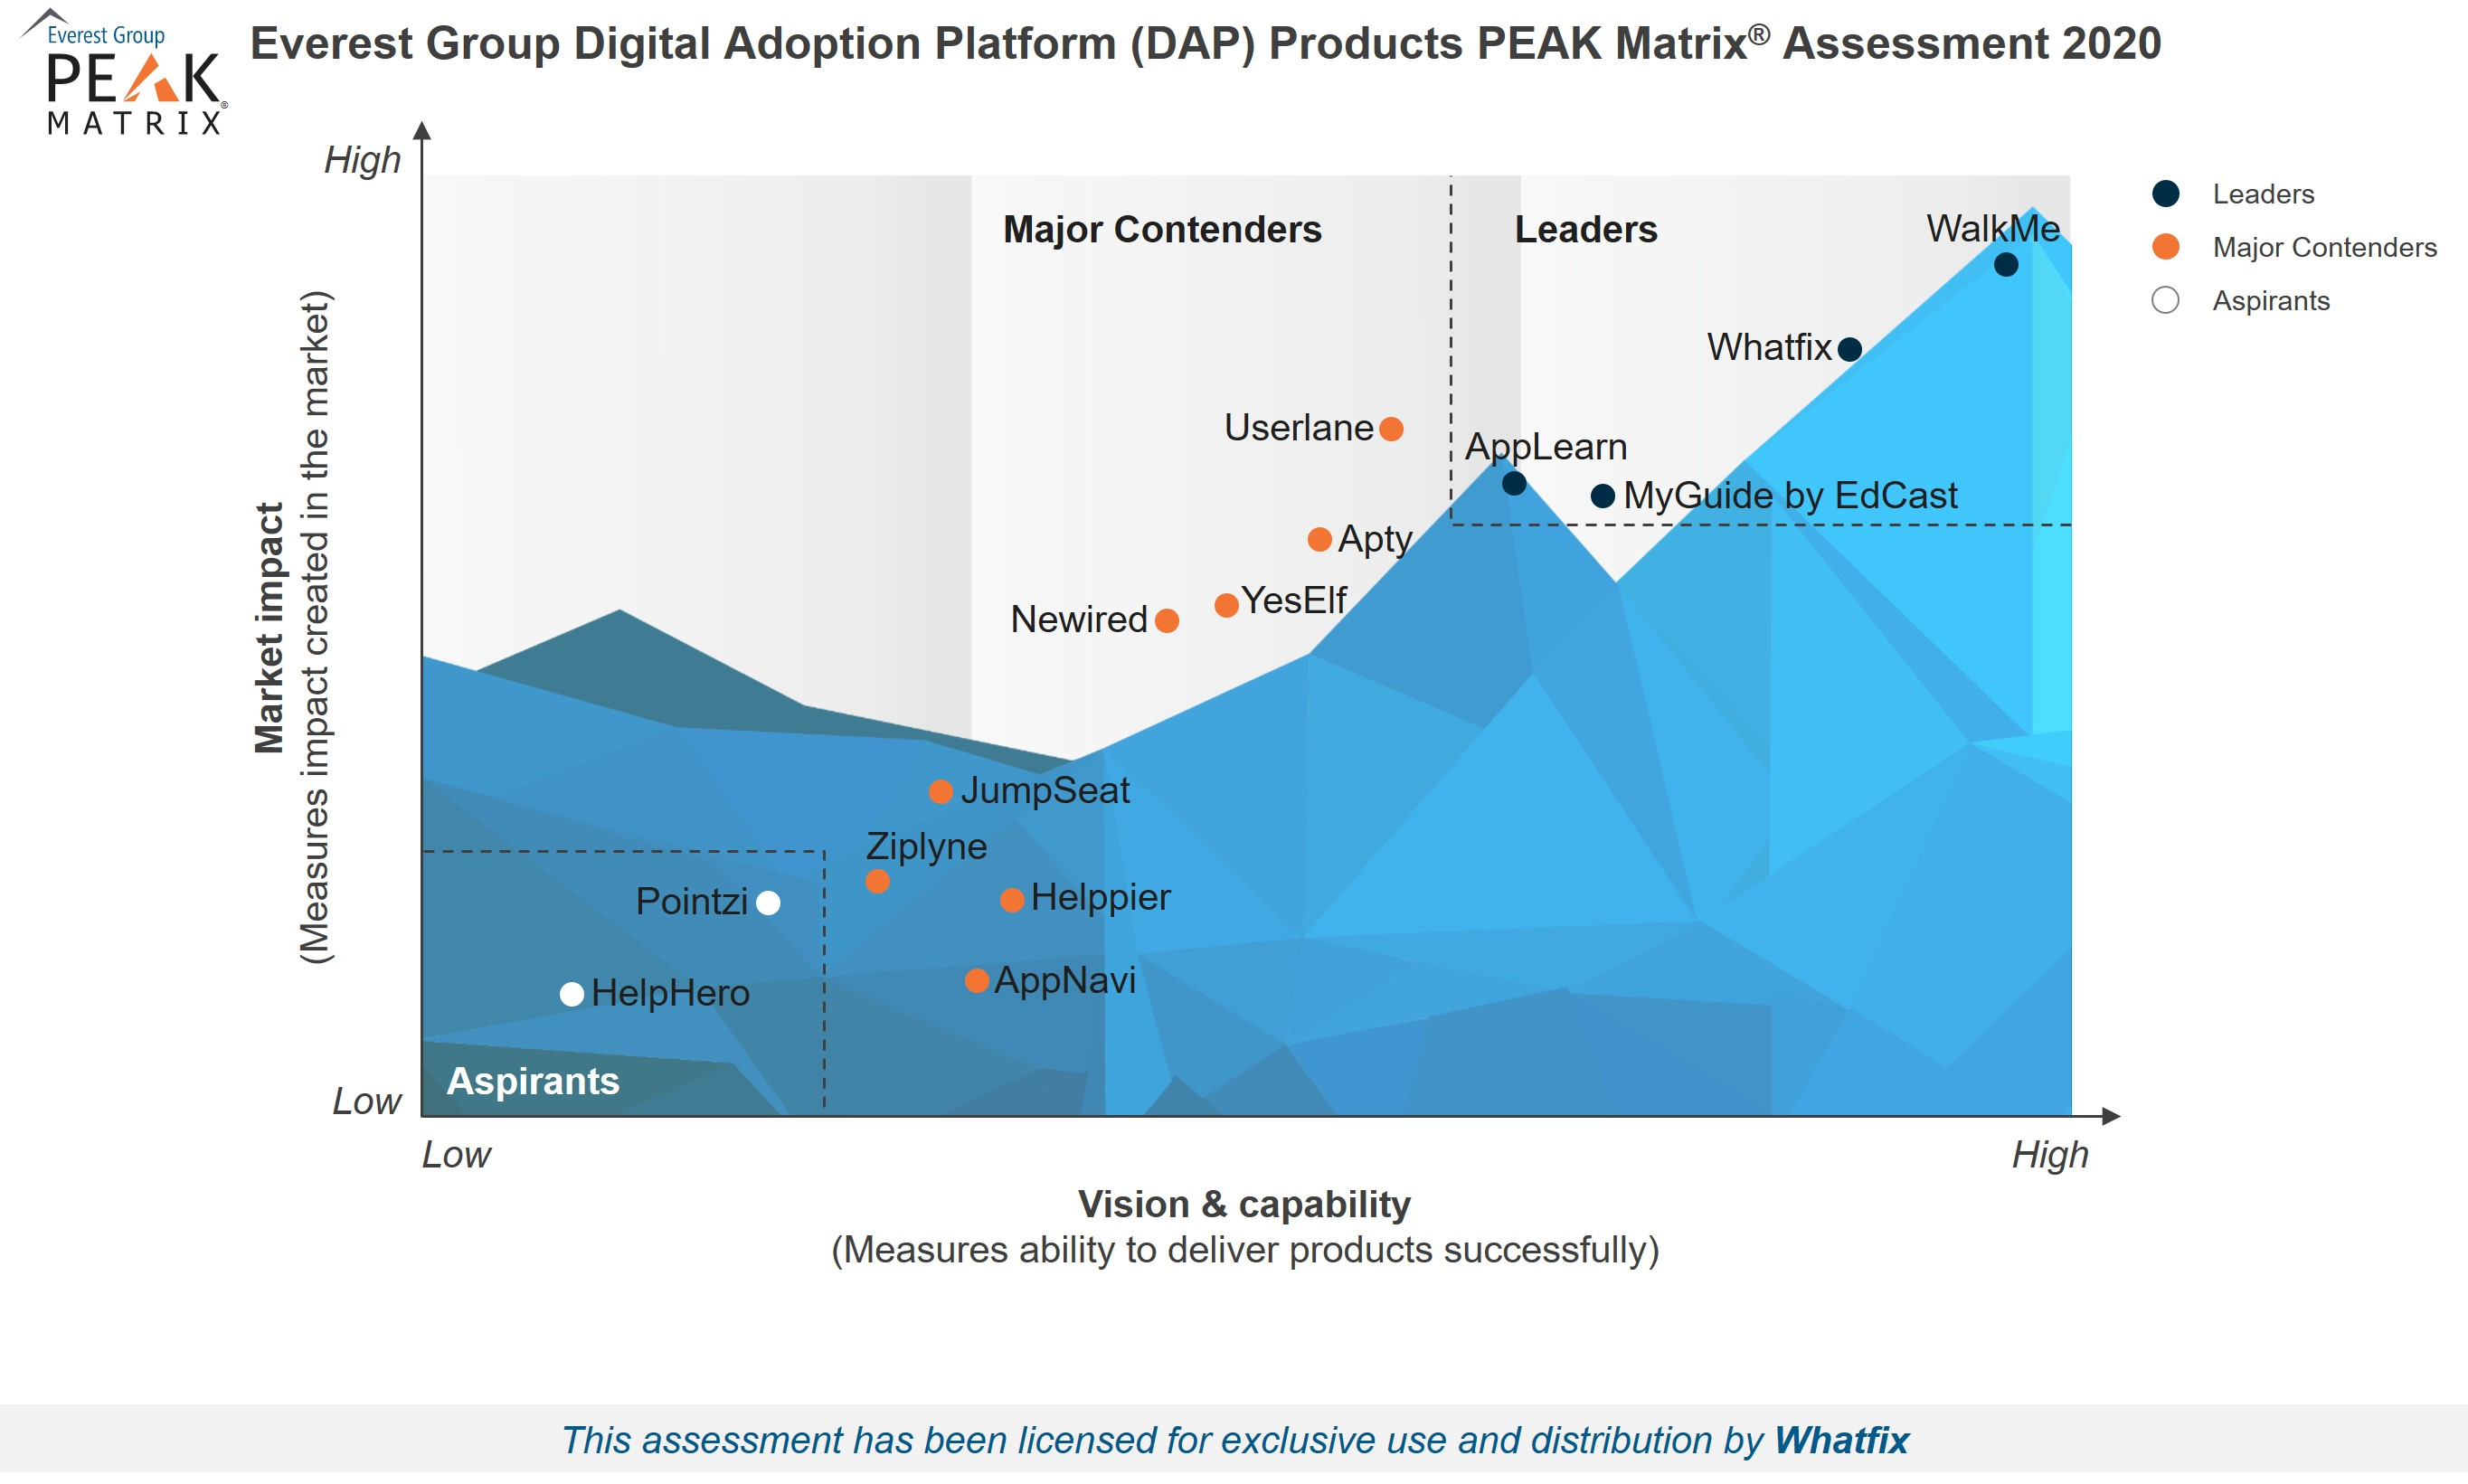 Everest_PEAK_Matrix_Digital_Adoption_Platforms